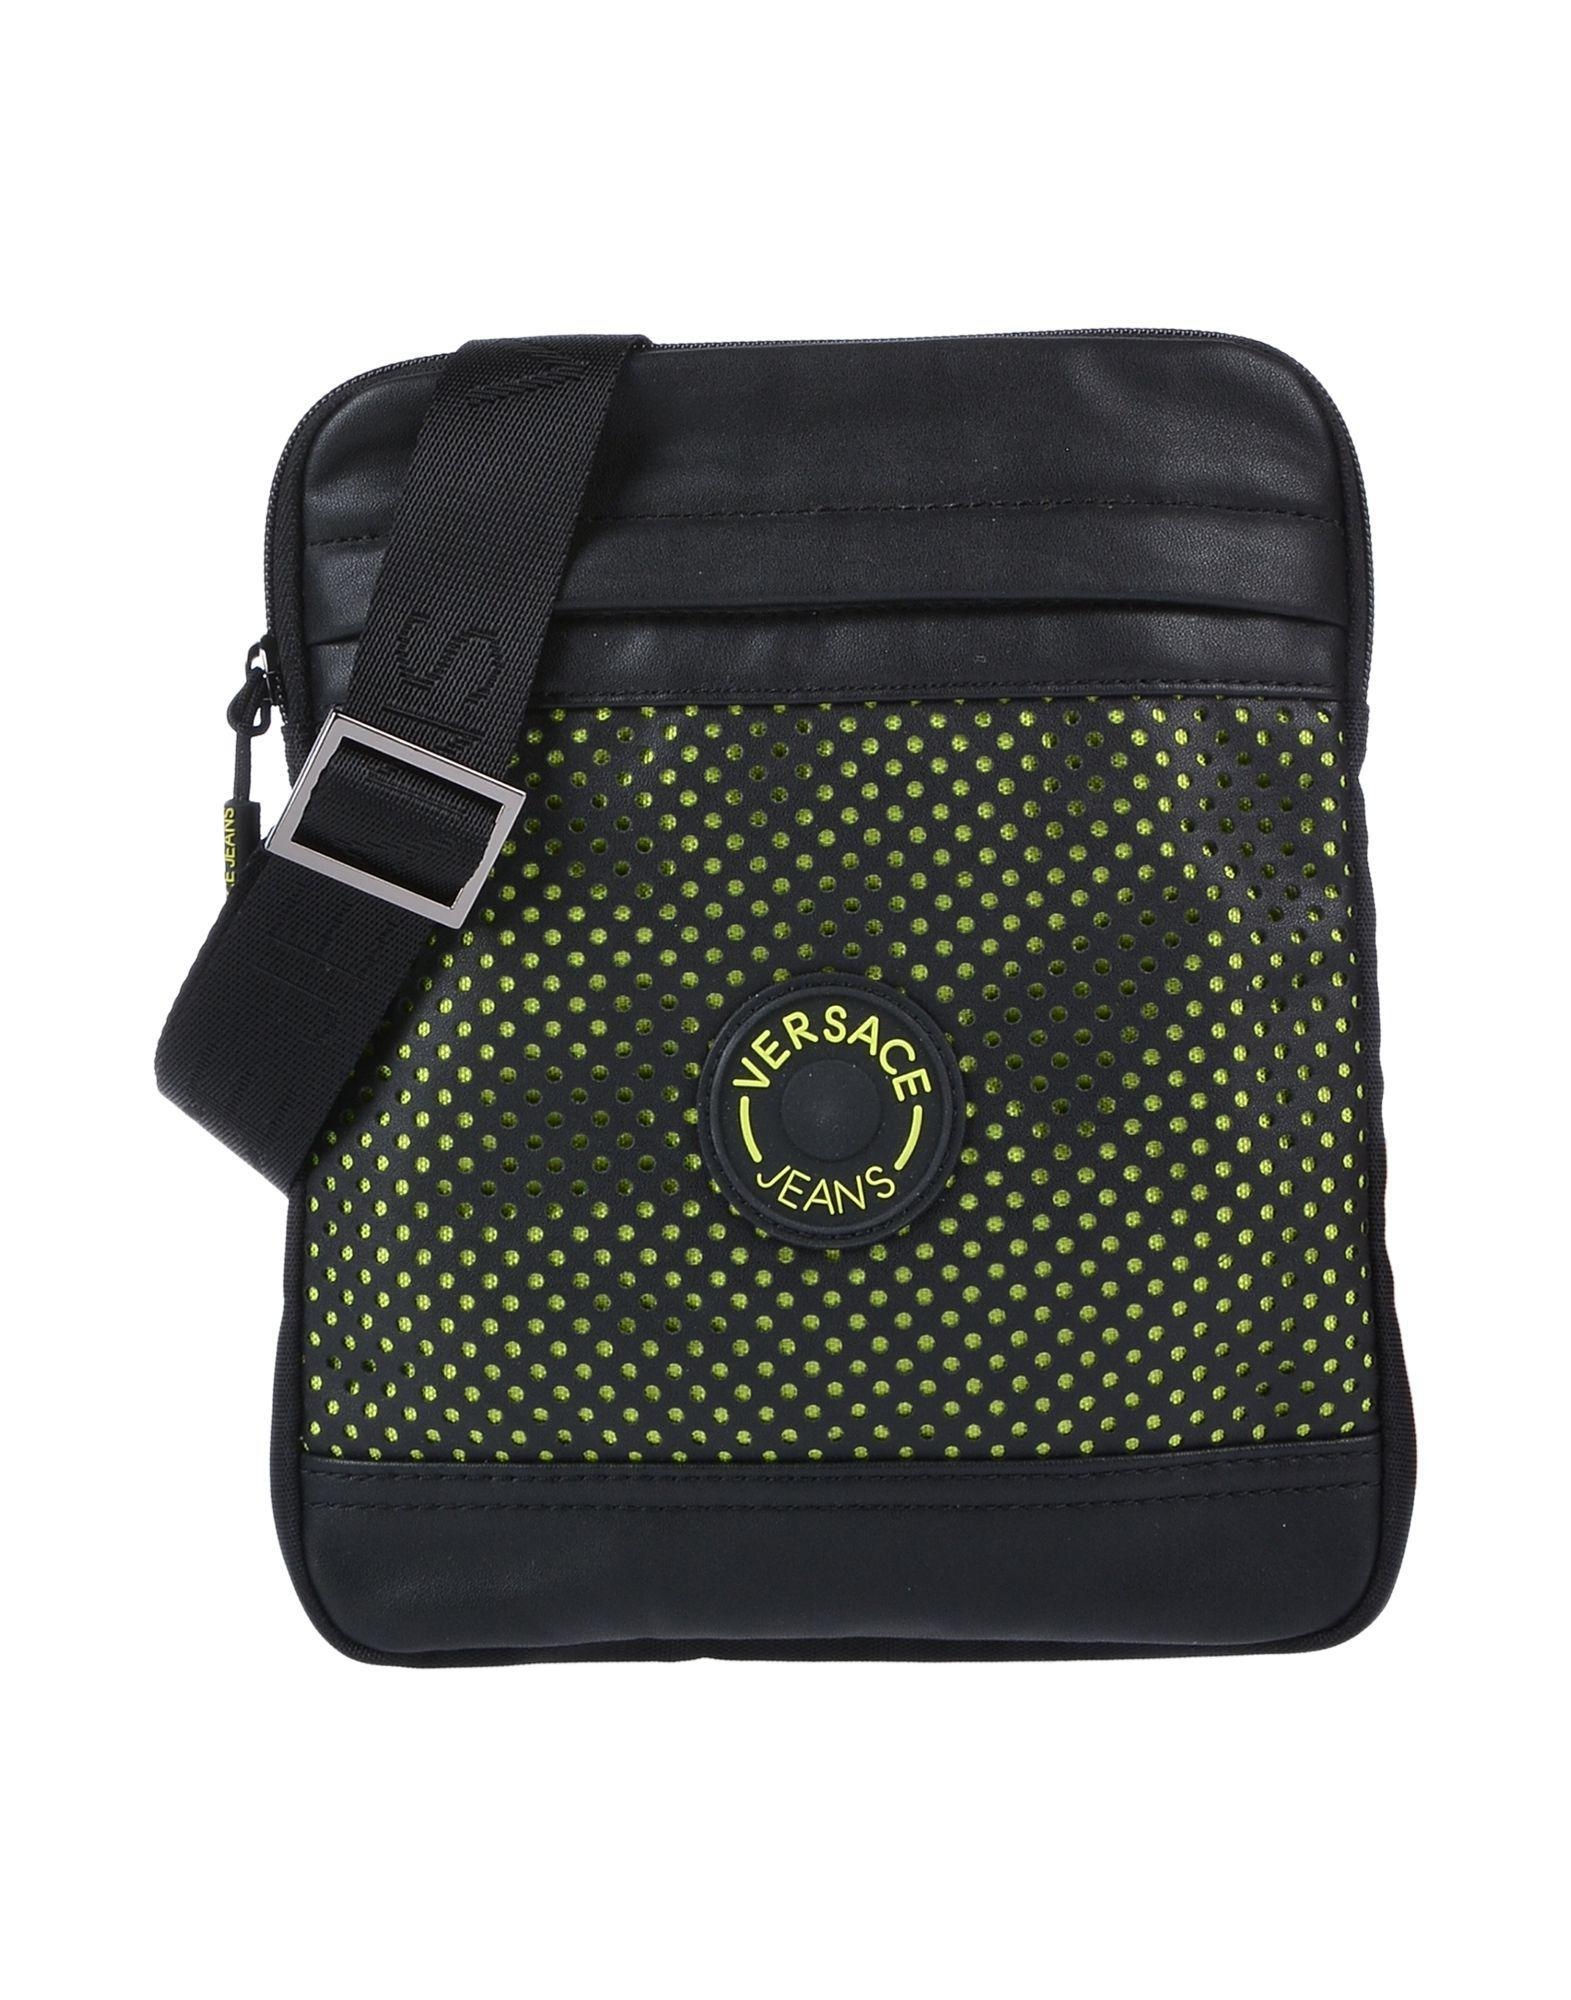 98a8d699b7e8 Versace Jeans Cross-body Bag in Black for Men - Lyst